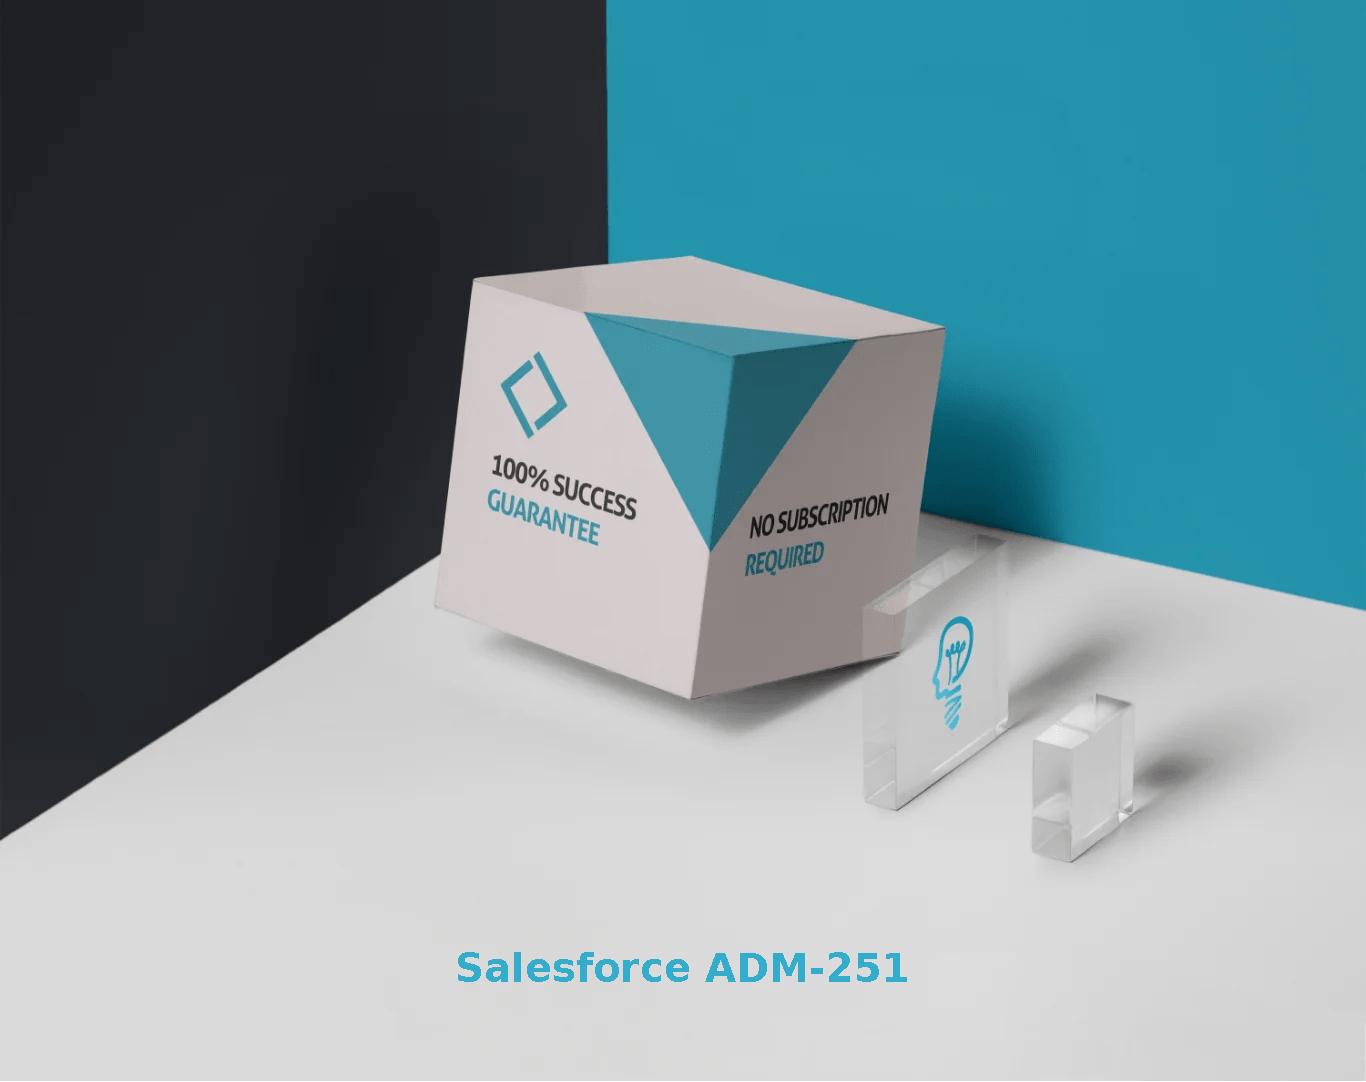 Salesforce ADM-251 Exams